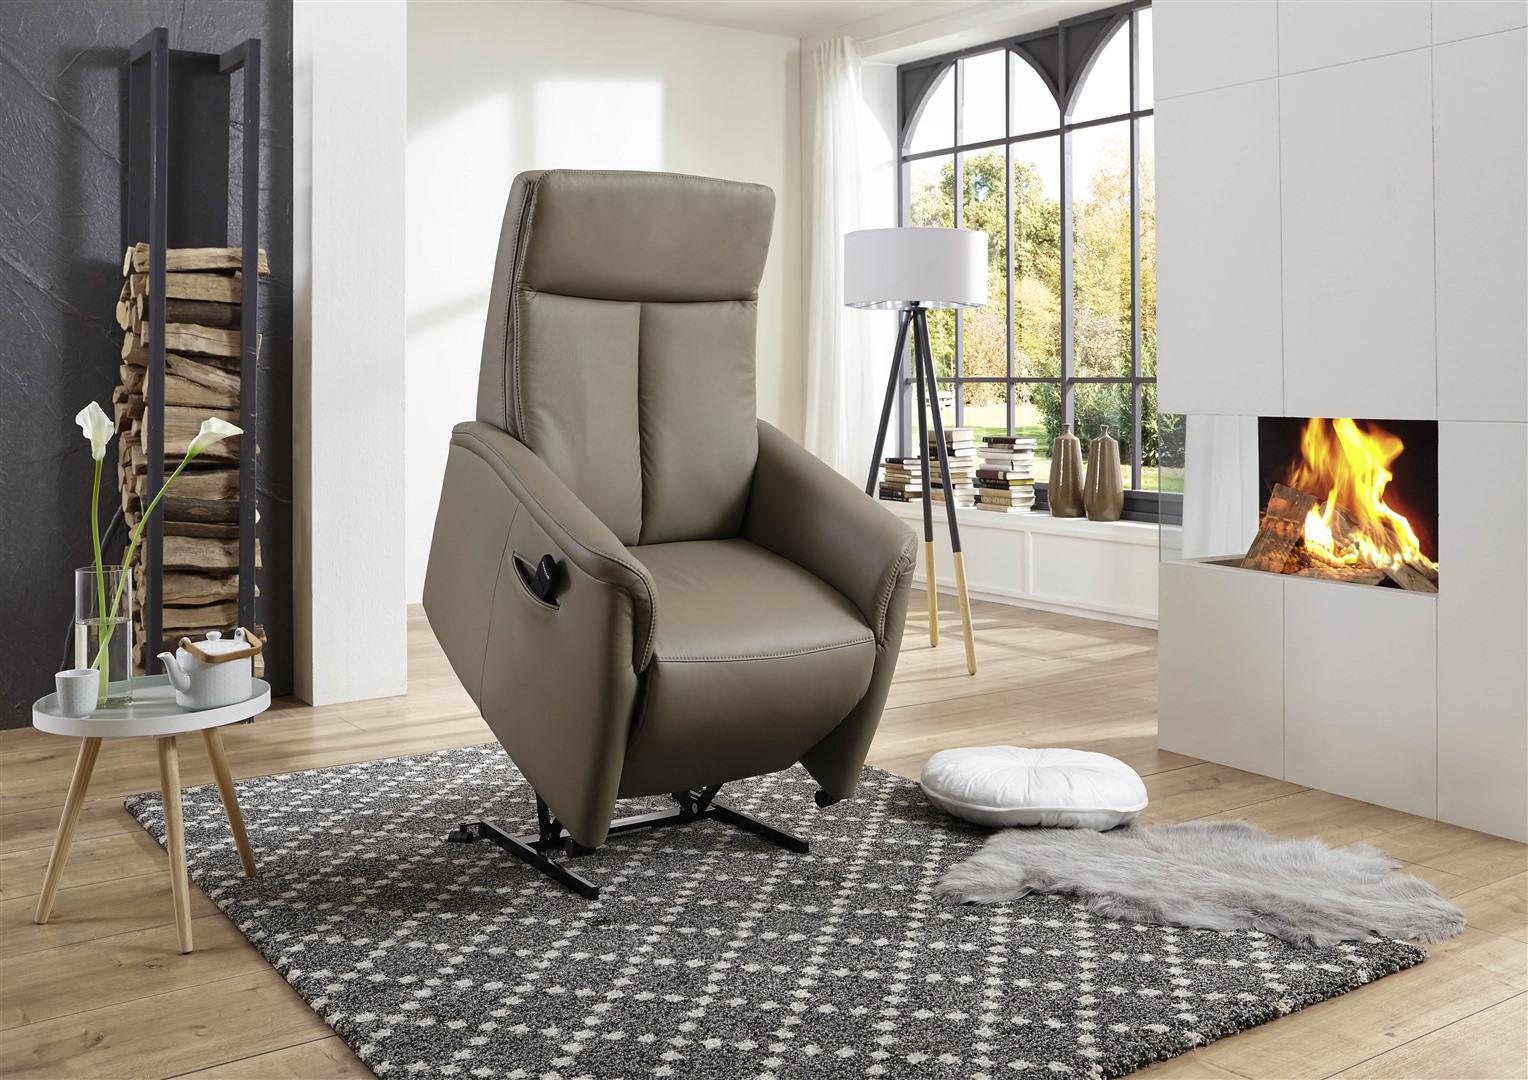 Interesse In Relax Elektrisch 1 Motor Met Opstahulp Leder Medium Shop Online Of Kom Langs Bij Colifac